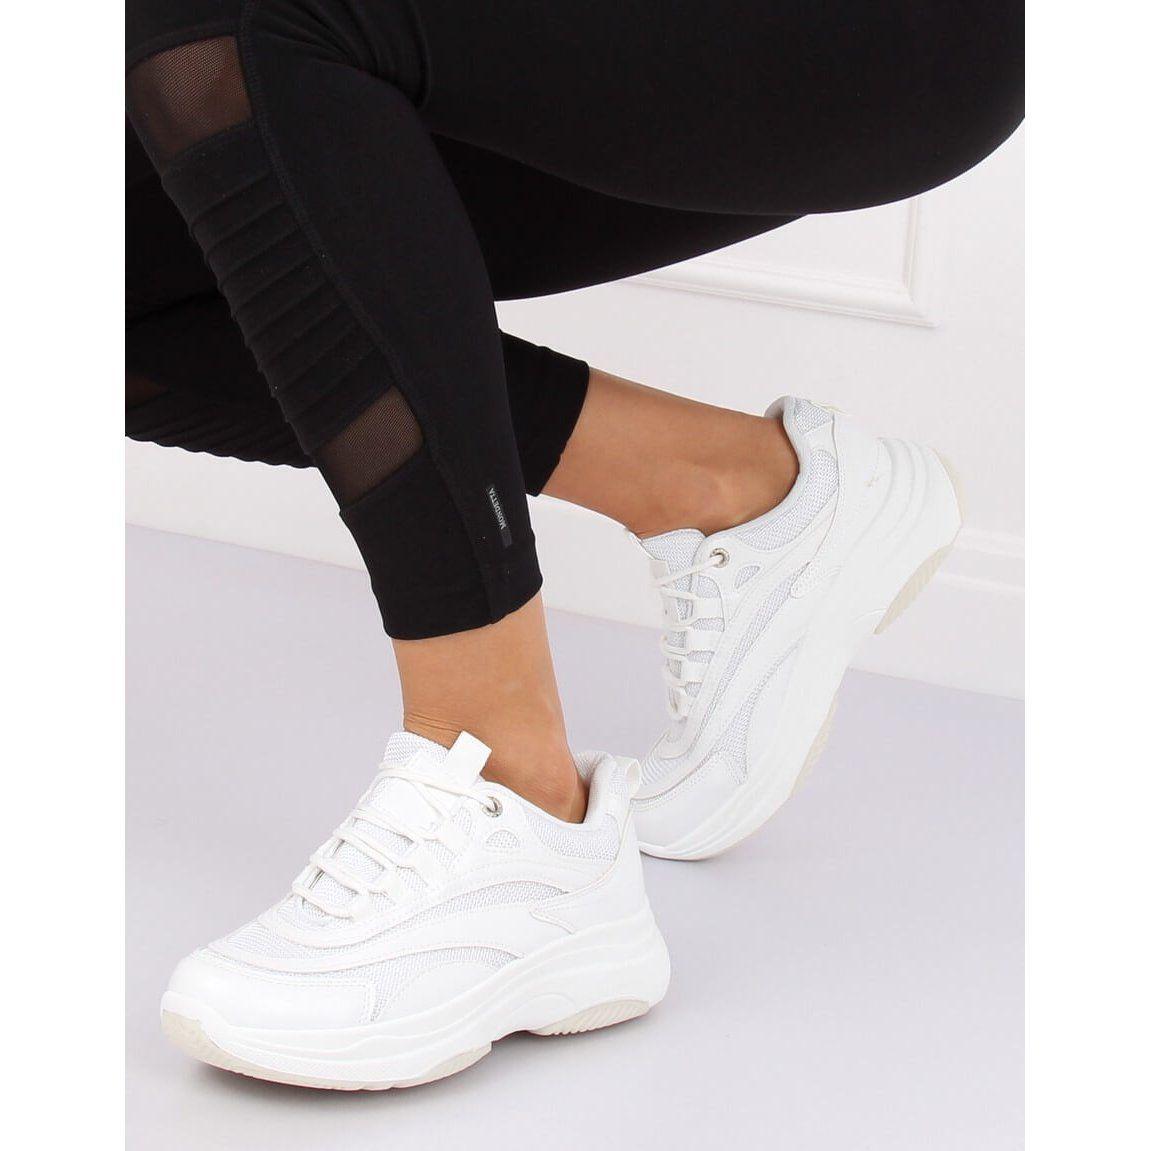 Buty Sportowe Damskie Biale B0 15 White Wedding Sneaker Shoes White Sneaker